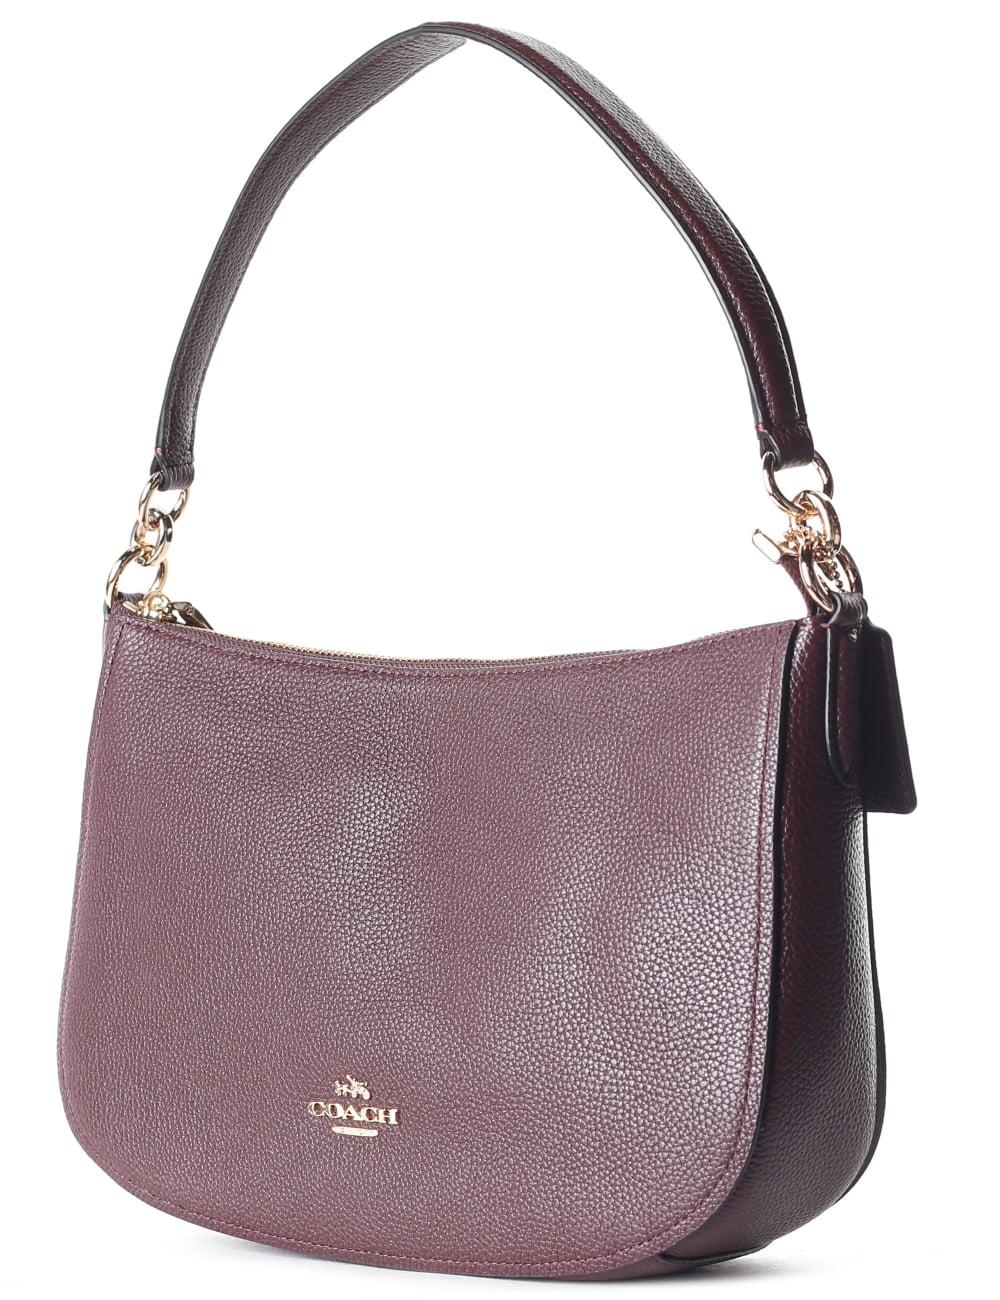 Coach Women s Chelsea Crossbody Bag 2363bcf7b4f5c